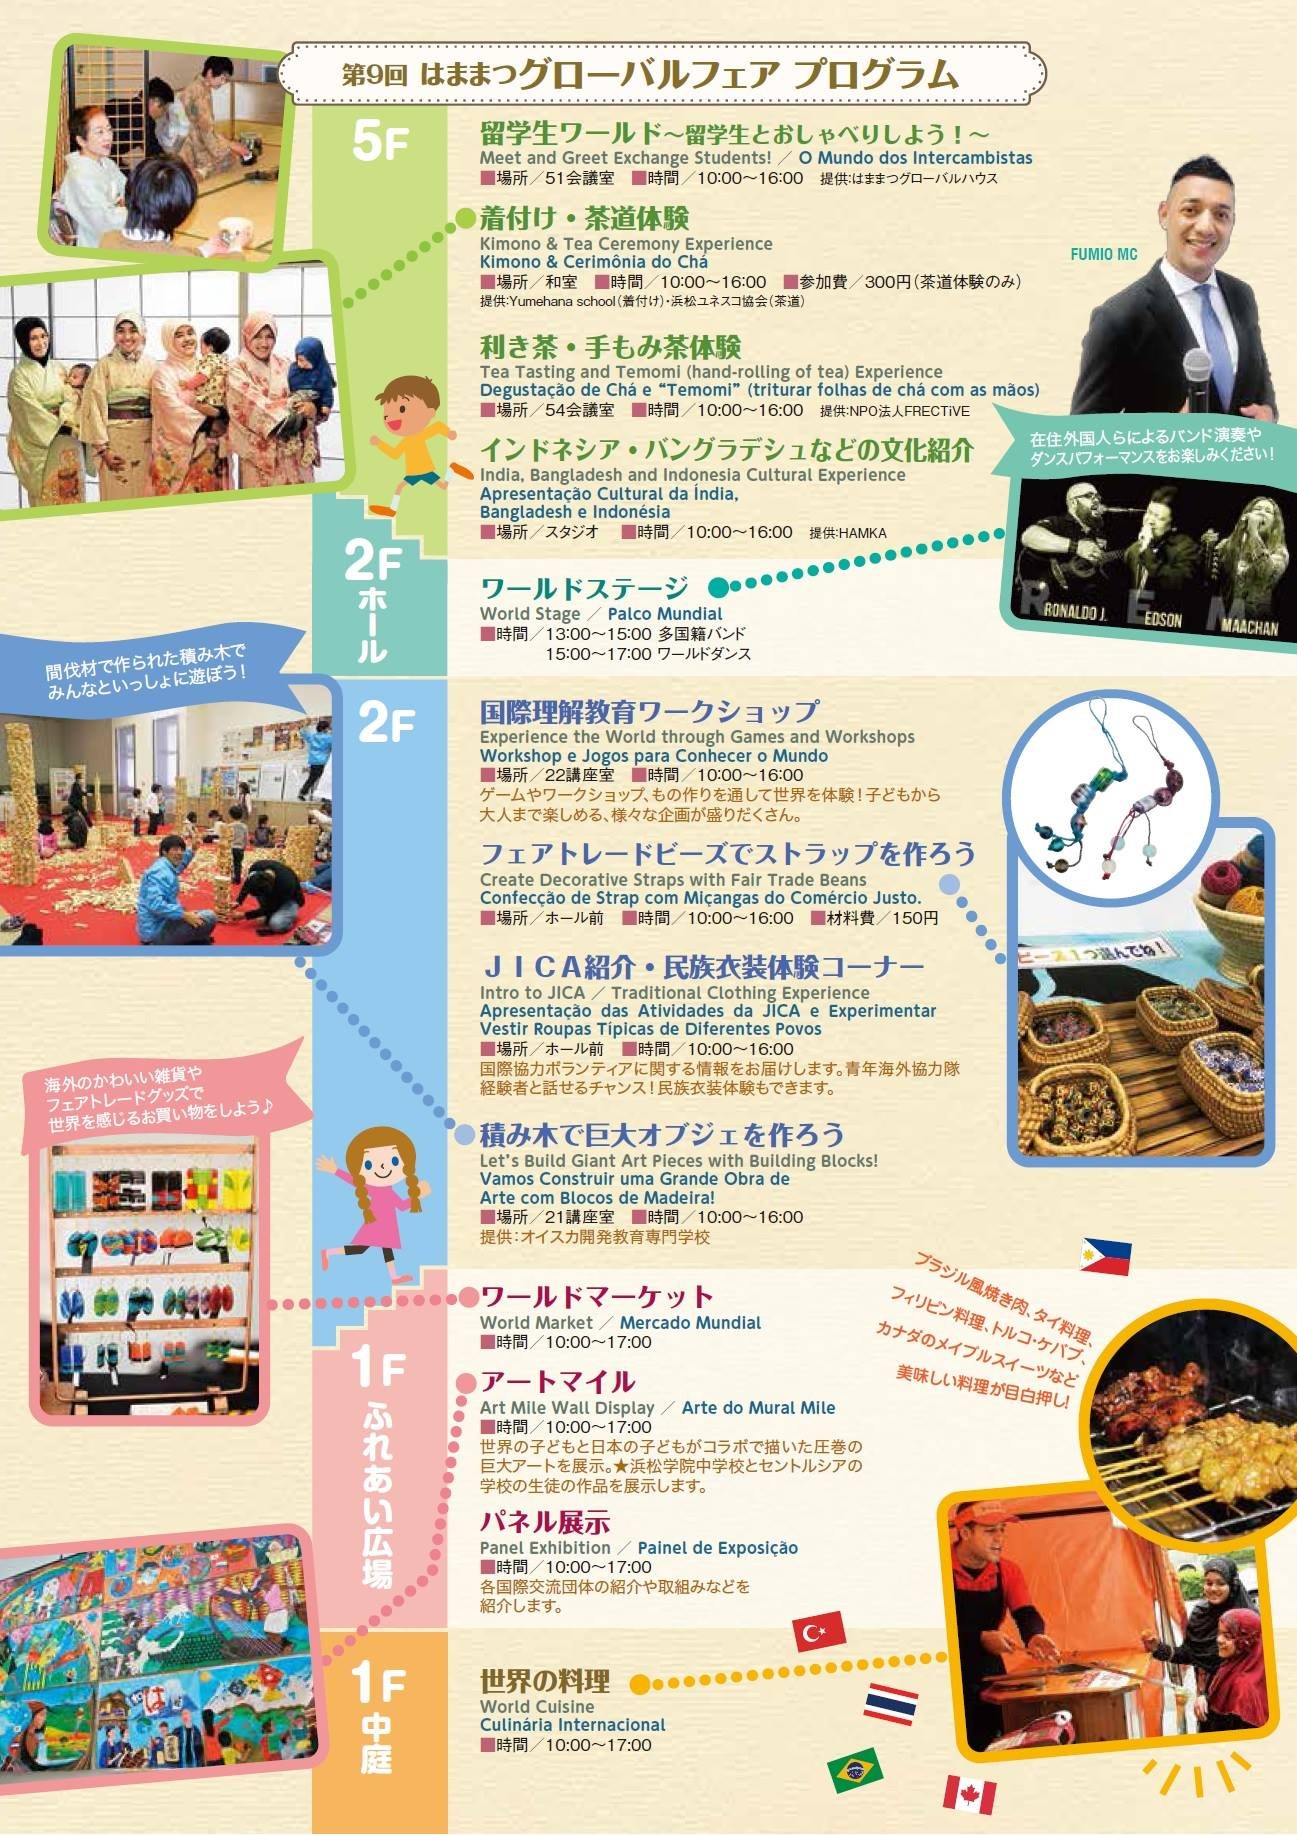 https://www.inhamamatsu.com/japanese/recommend/gbf2019_ura.jpg